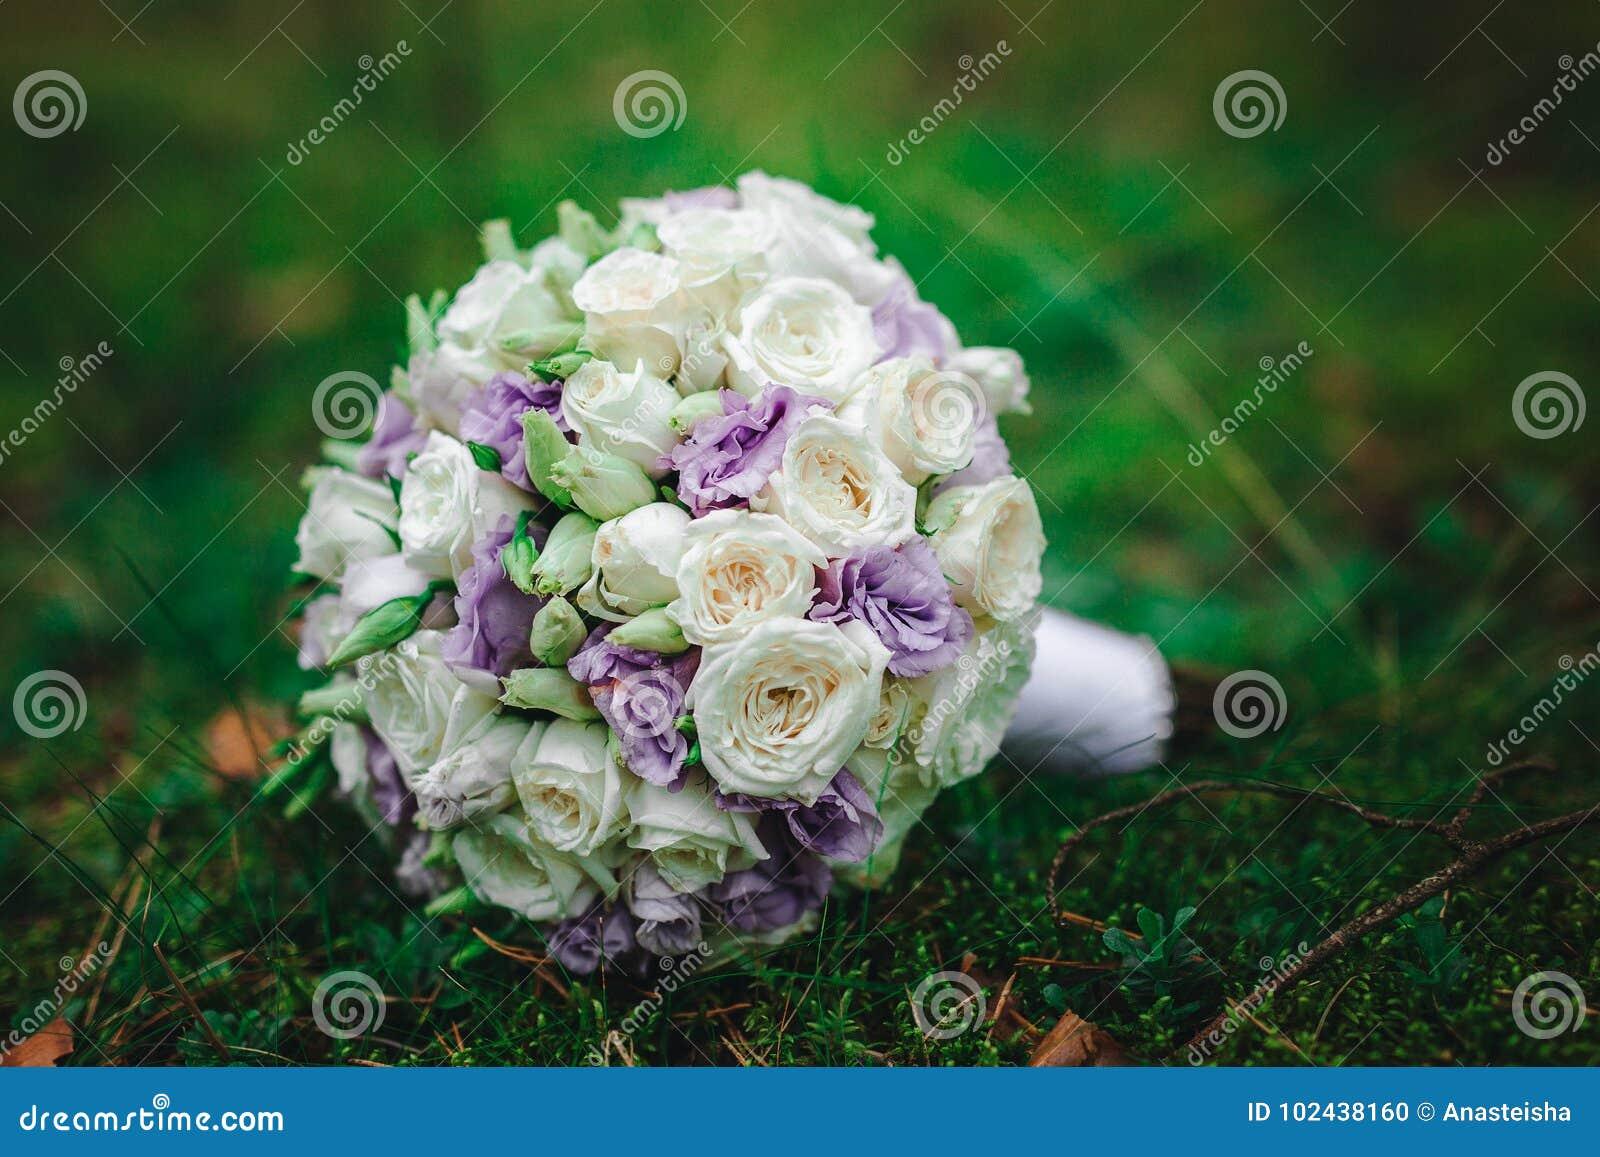 Wedding bouquet bride with purple flowers stock photo image of download wedding bouquet bride with purple flowers stock photo image of happiness decoration izmirmasajfo